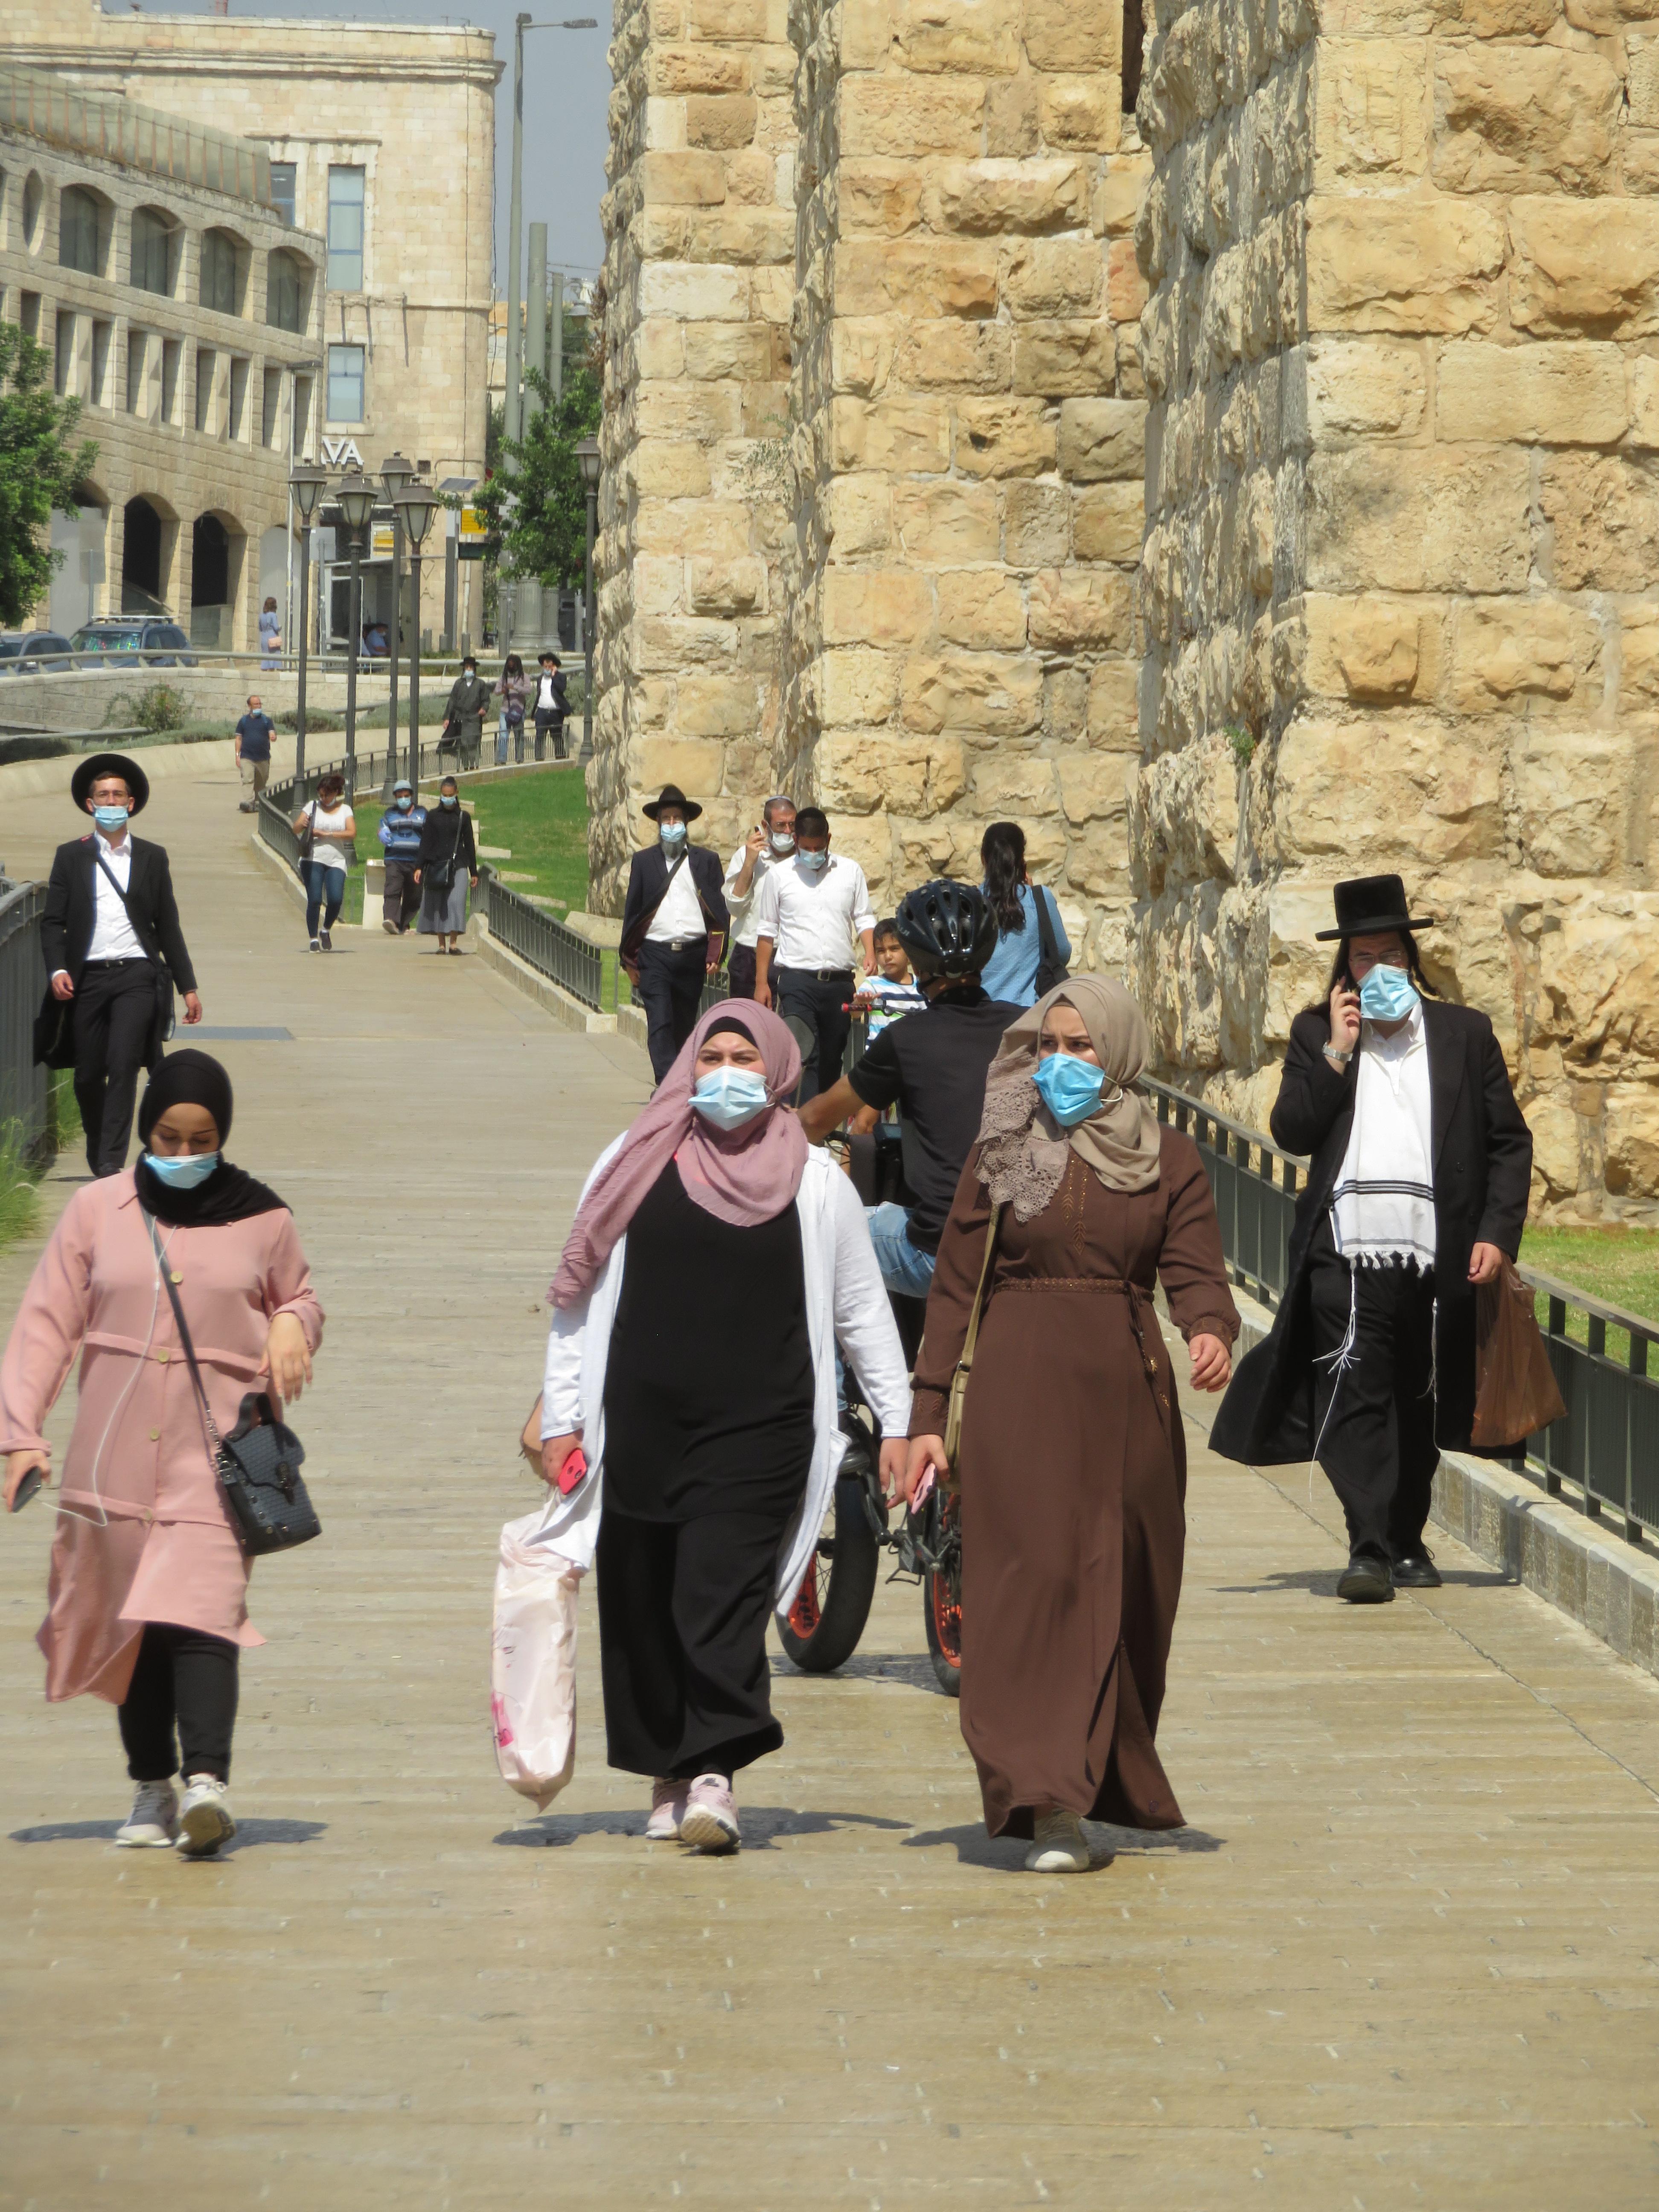 Walking in Jerusalem.  Israelis and Palestinians must wear a face mask in public or risk a steep fine in Israel.